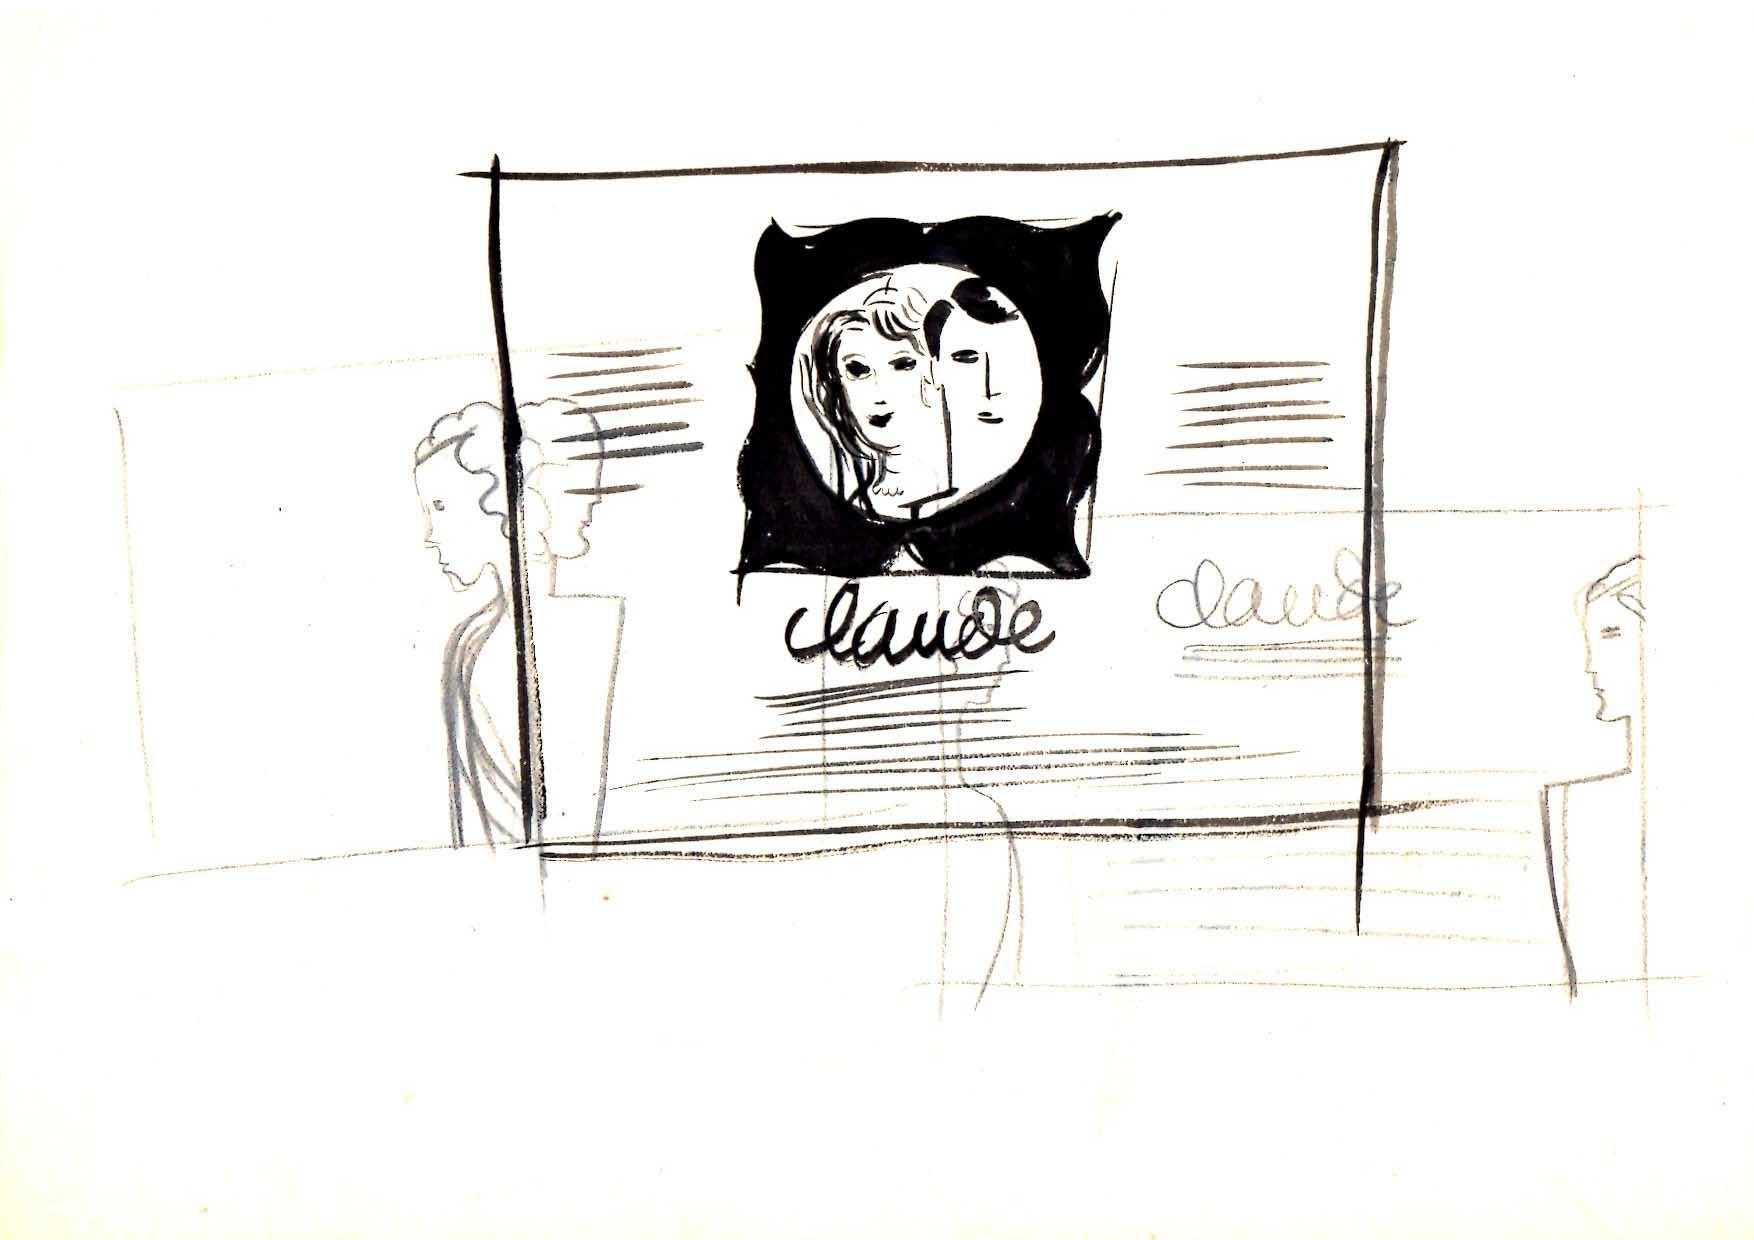 Jacques Grange | Claude Claude |